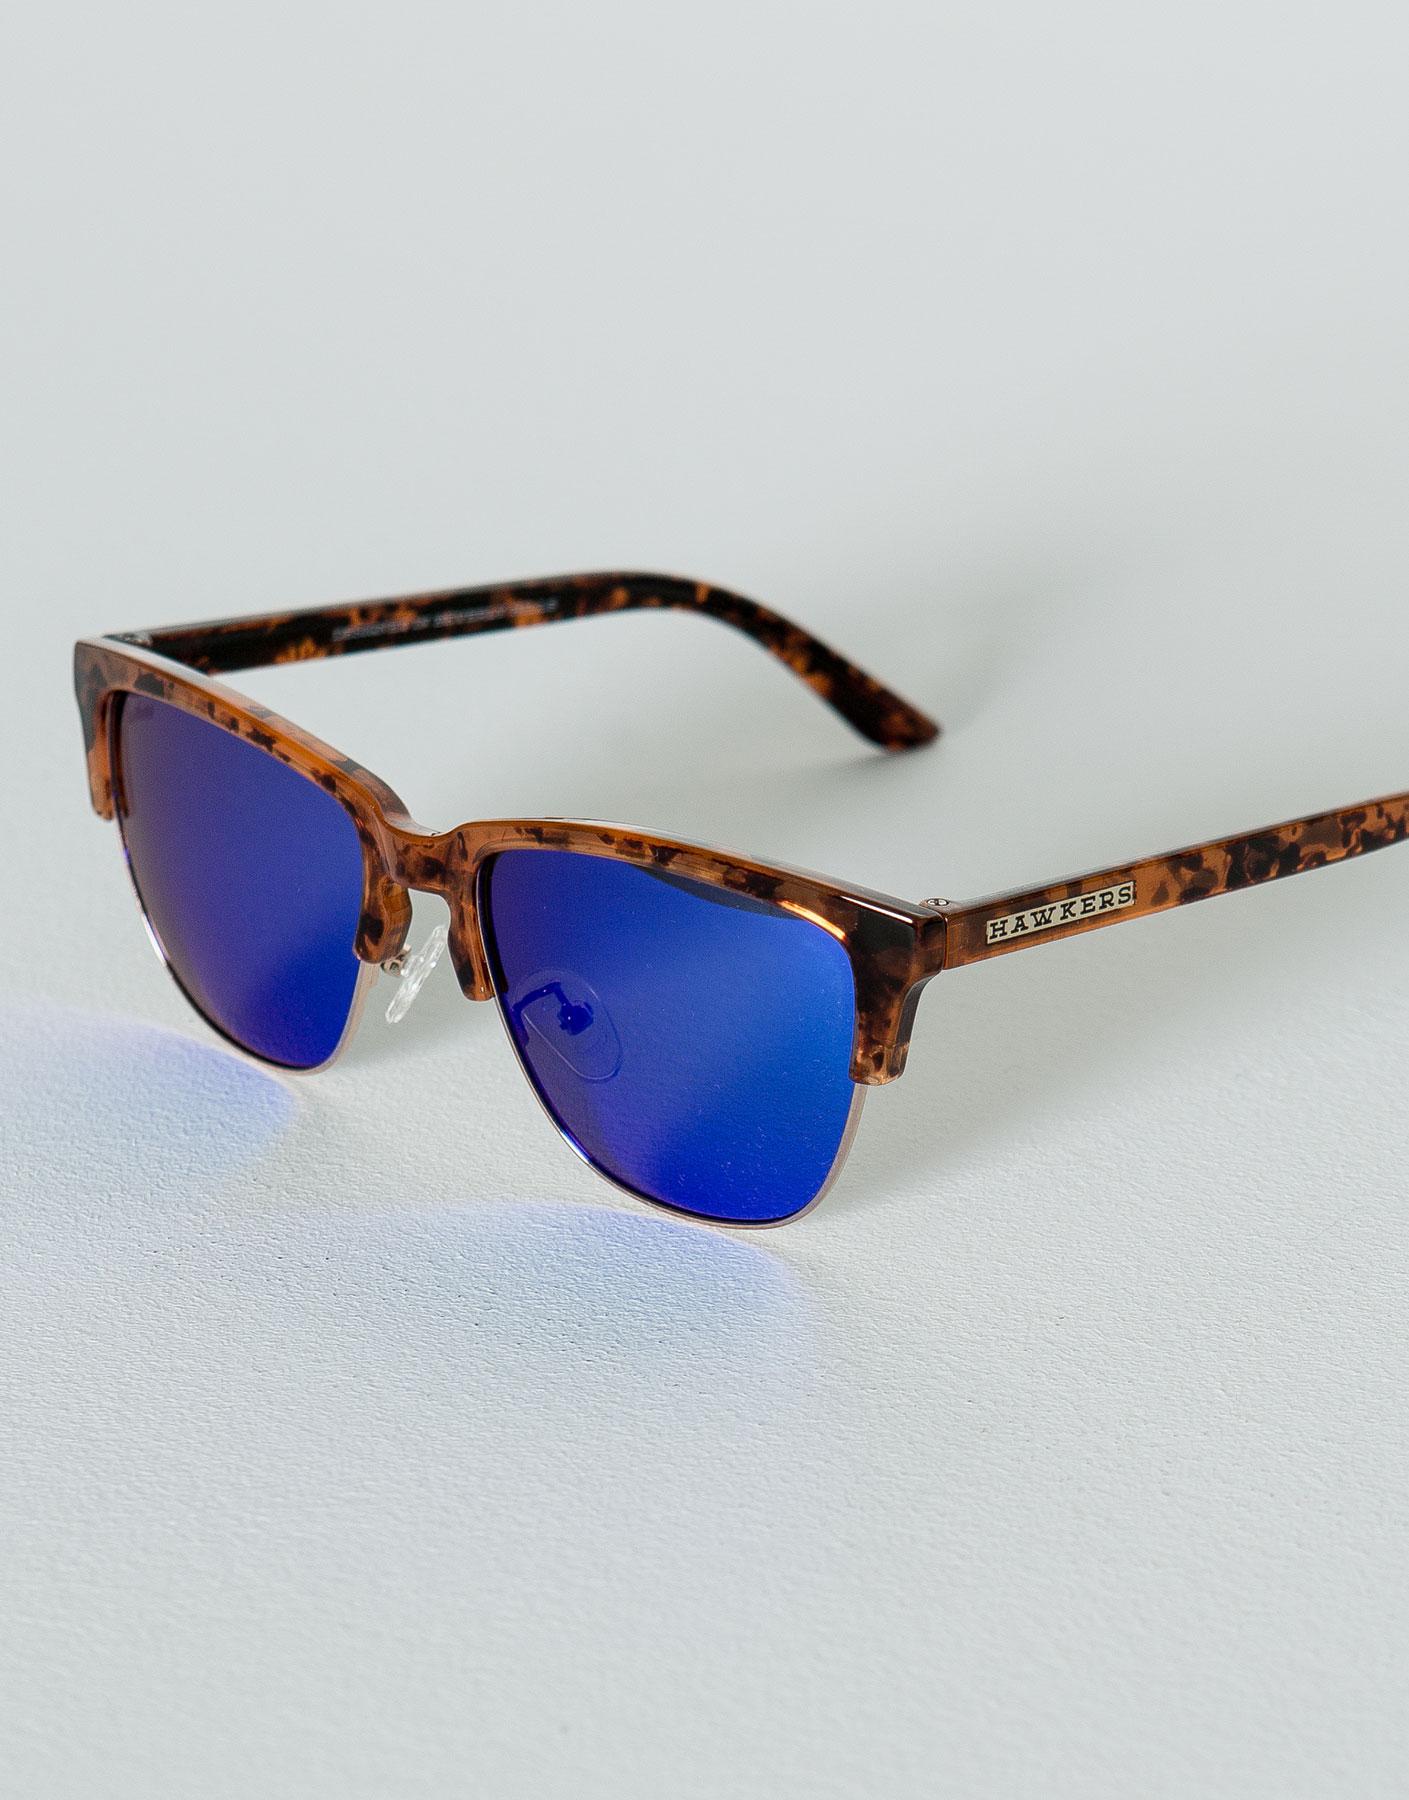 Sky Hawkers Tortoiseshell Sunglasses